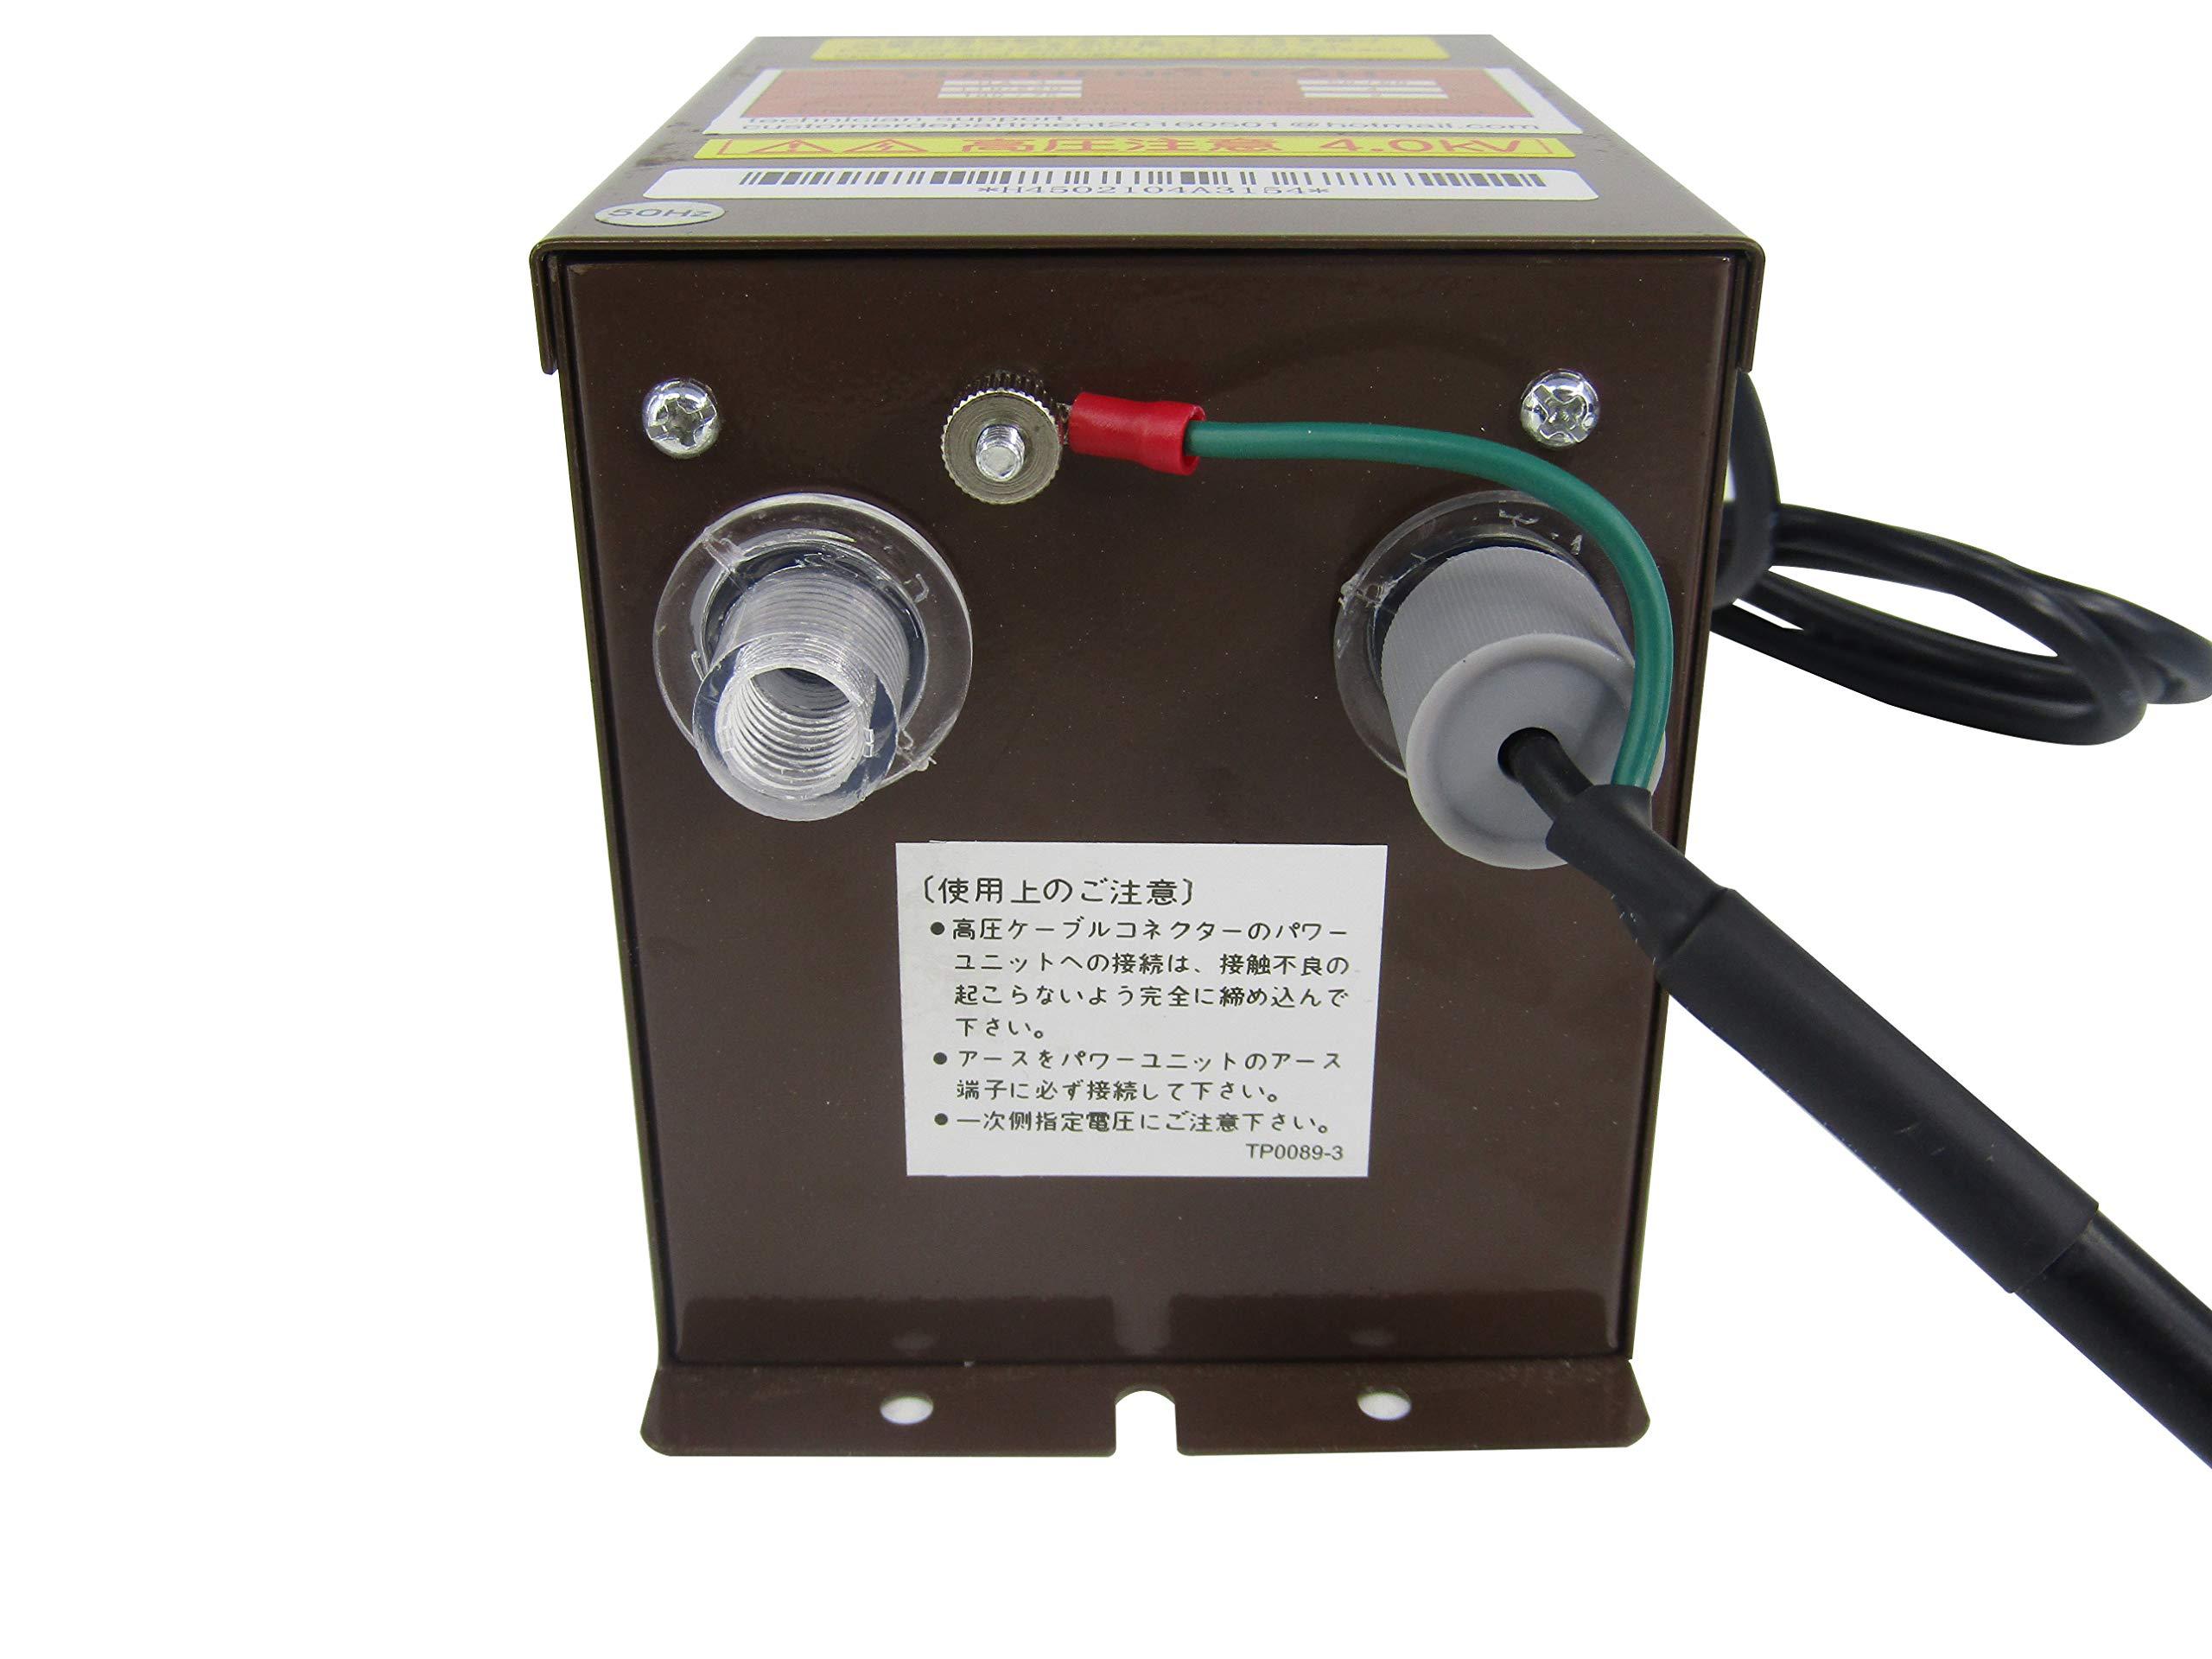 YUCHENGTECH Ionizing Air Gun Antistatic Sprayer Static Electrostatic Eliminator + High Voltage Generator 110V by YUCHENGTECH (Image #6)